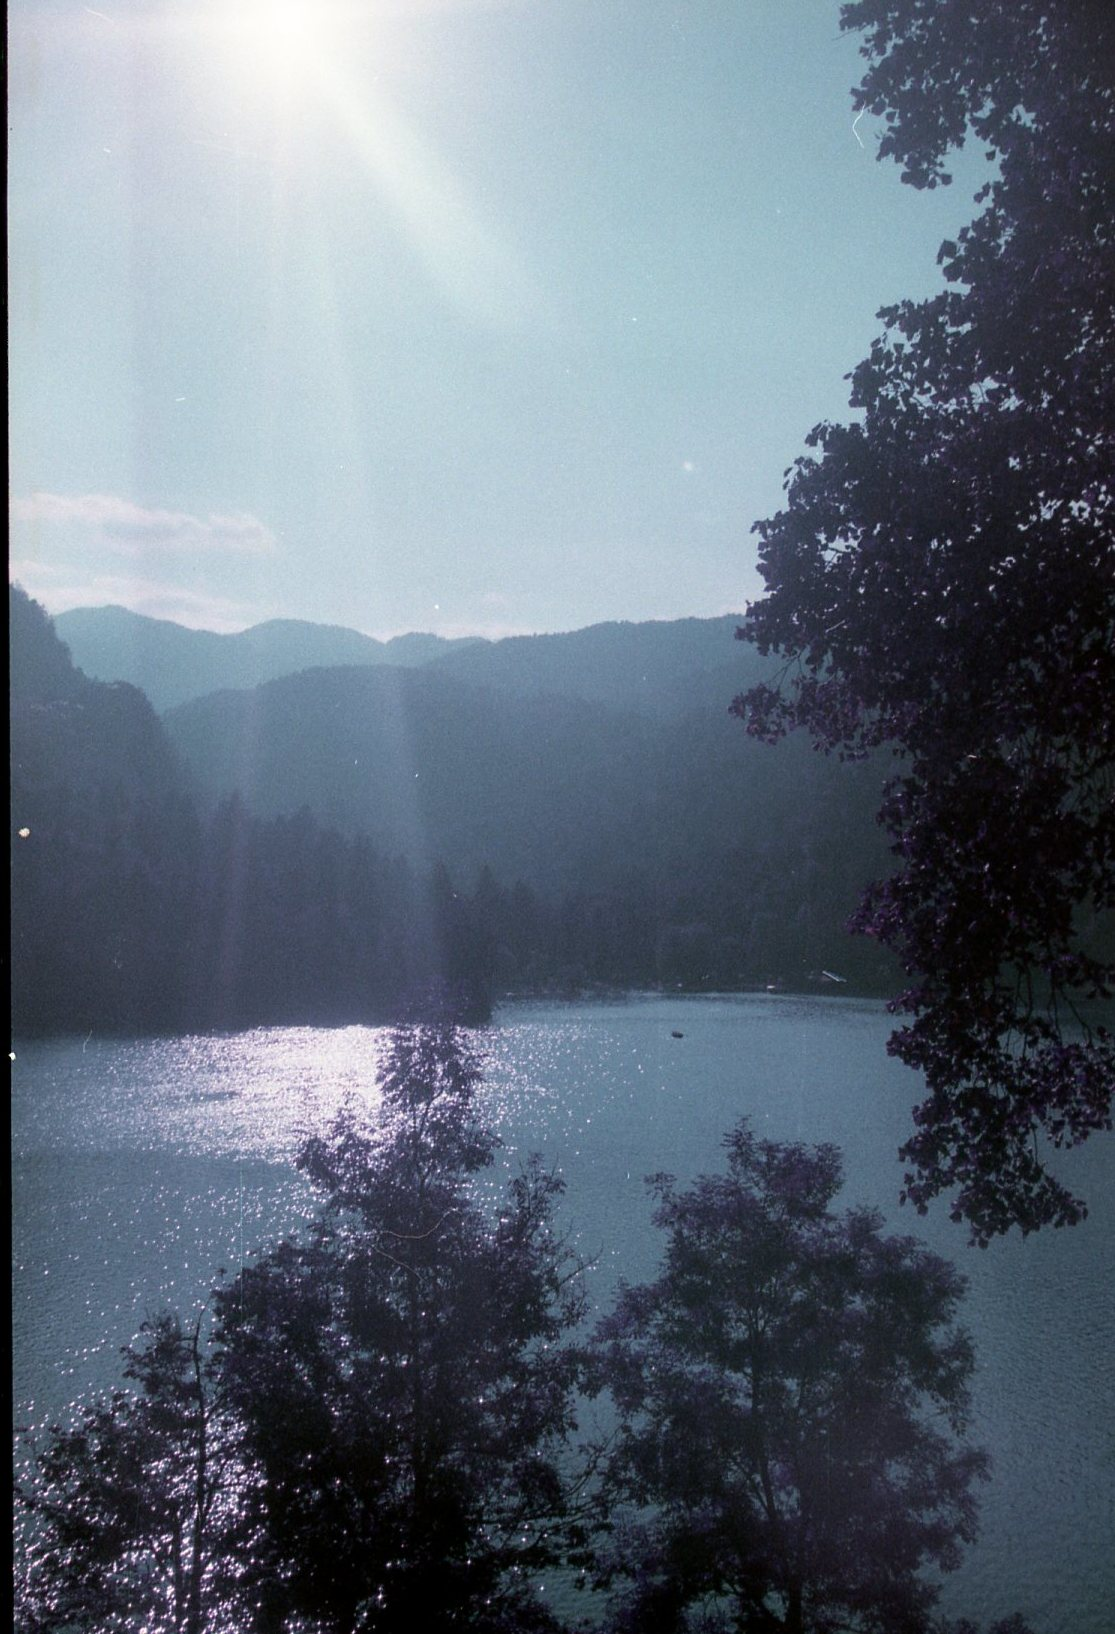 Slovenia067.jpg